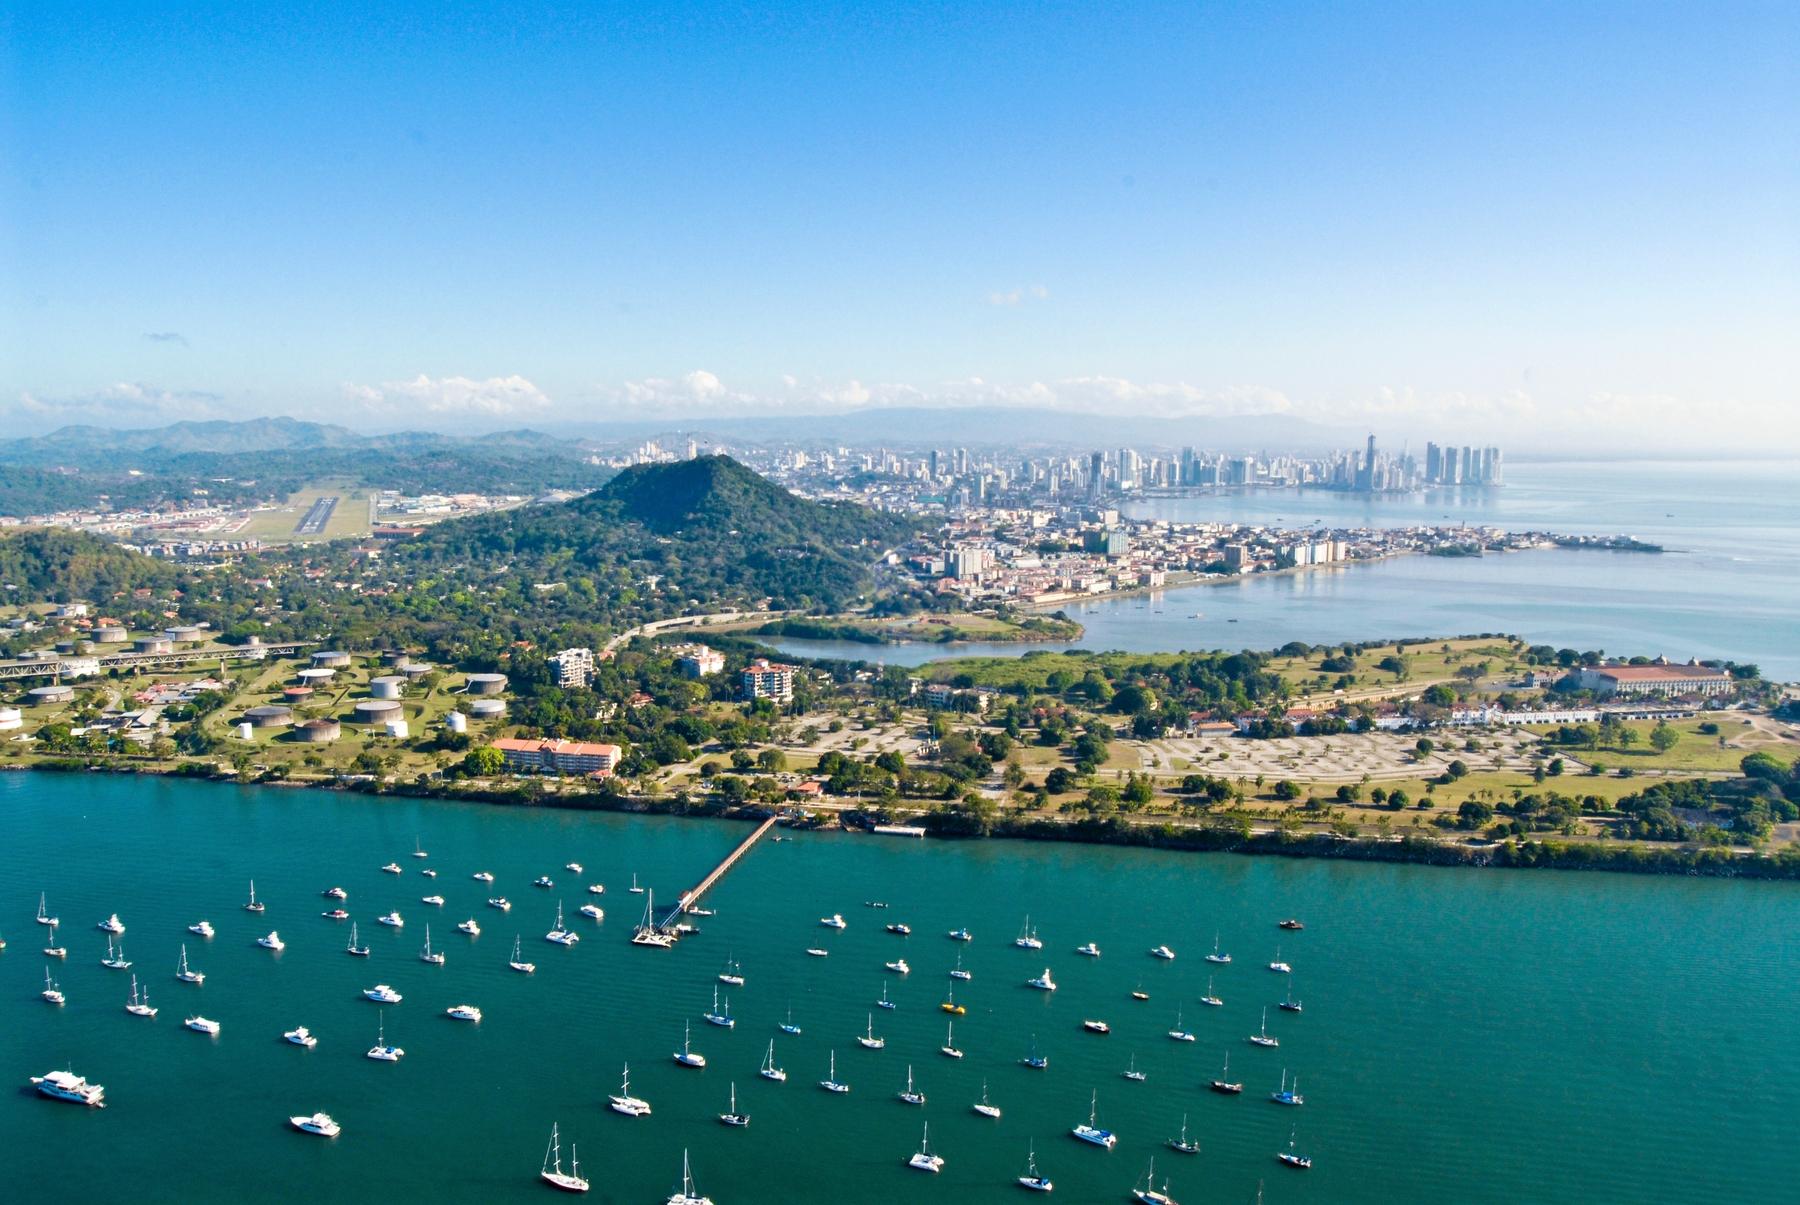 Aerial view of Panama